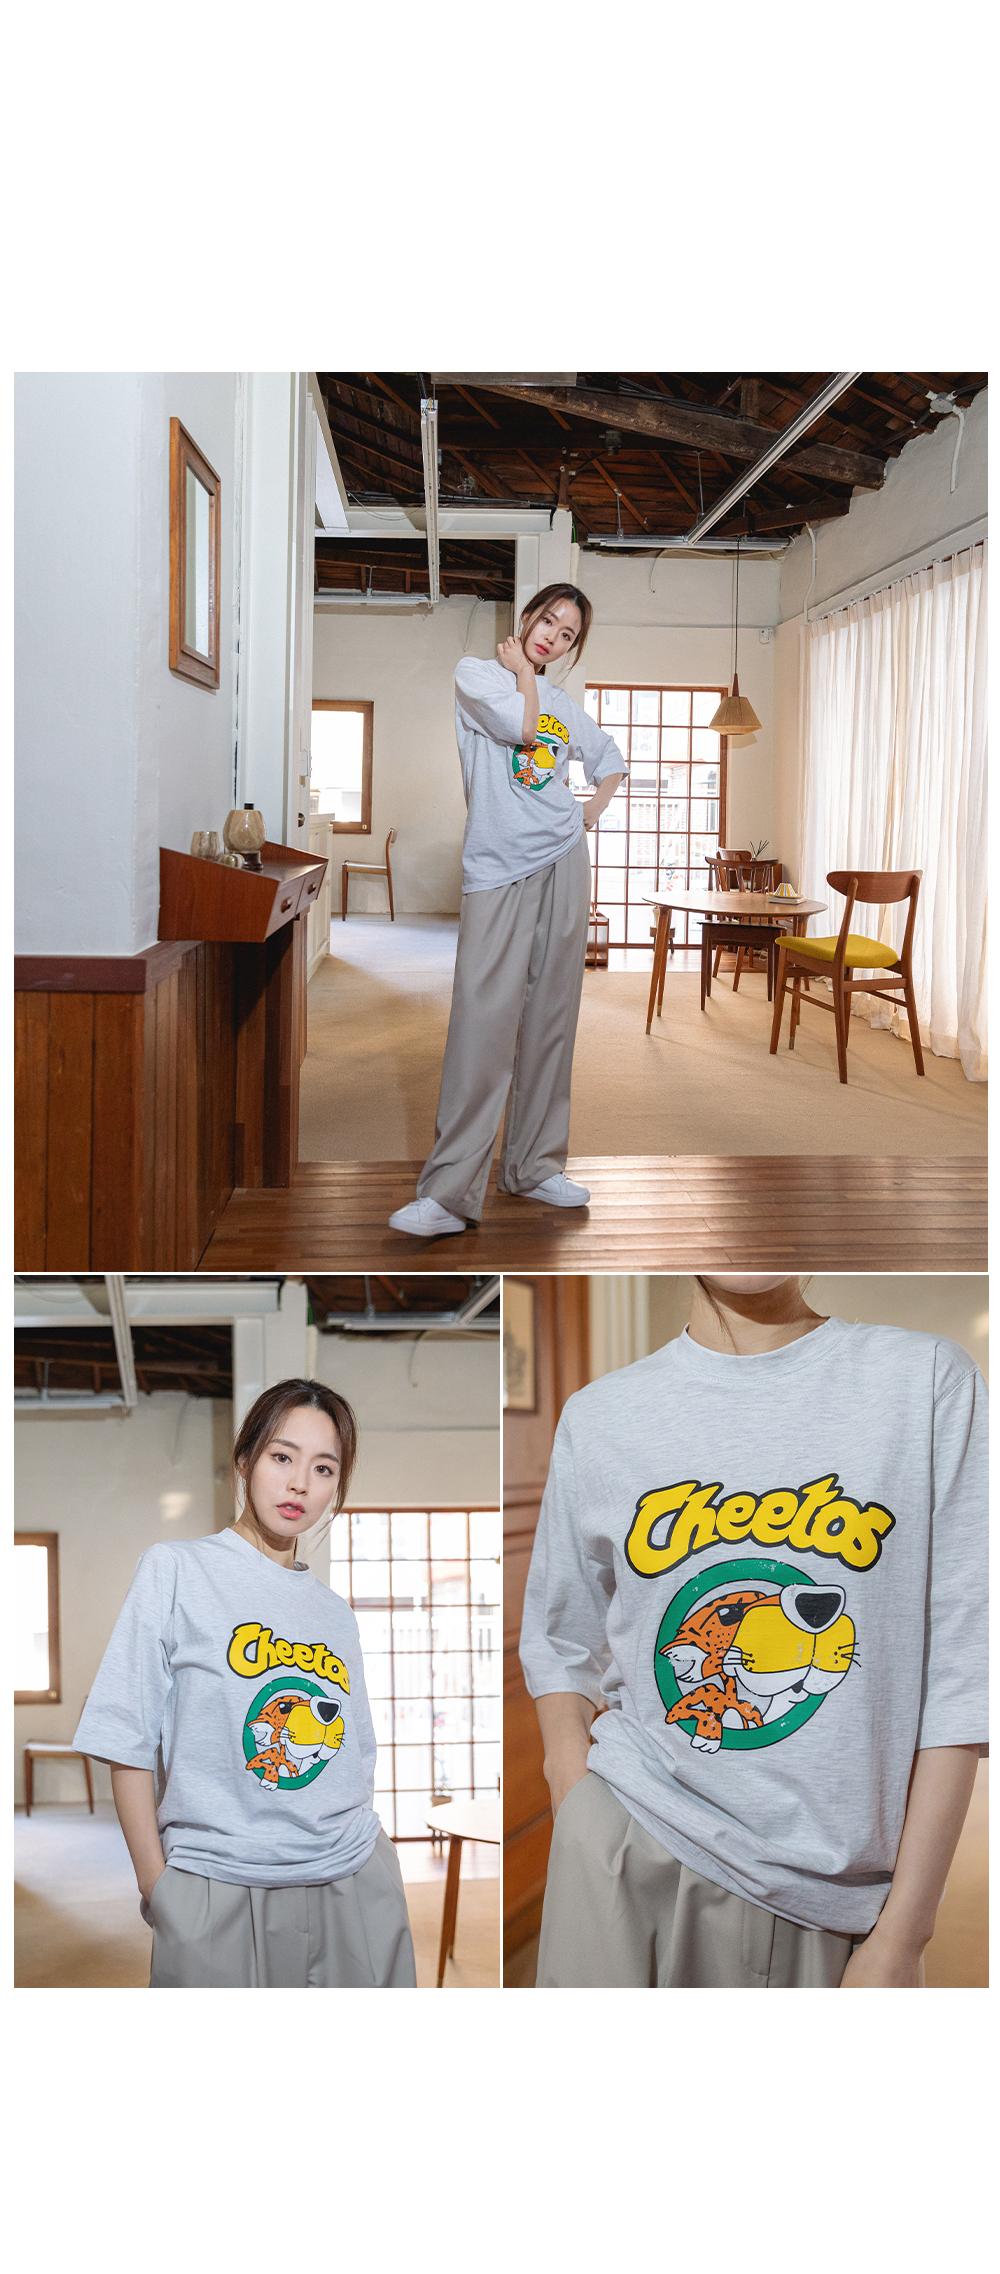 Tiger Cheetos T-shirt